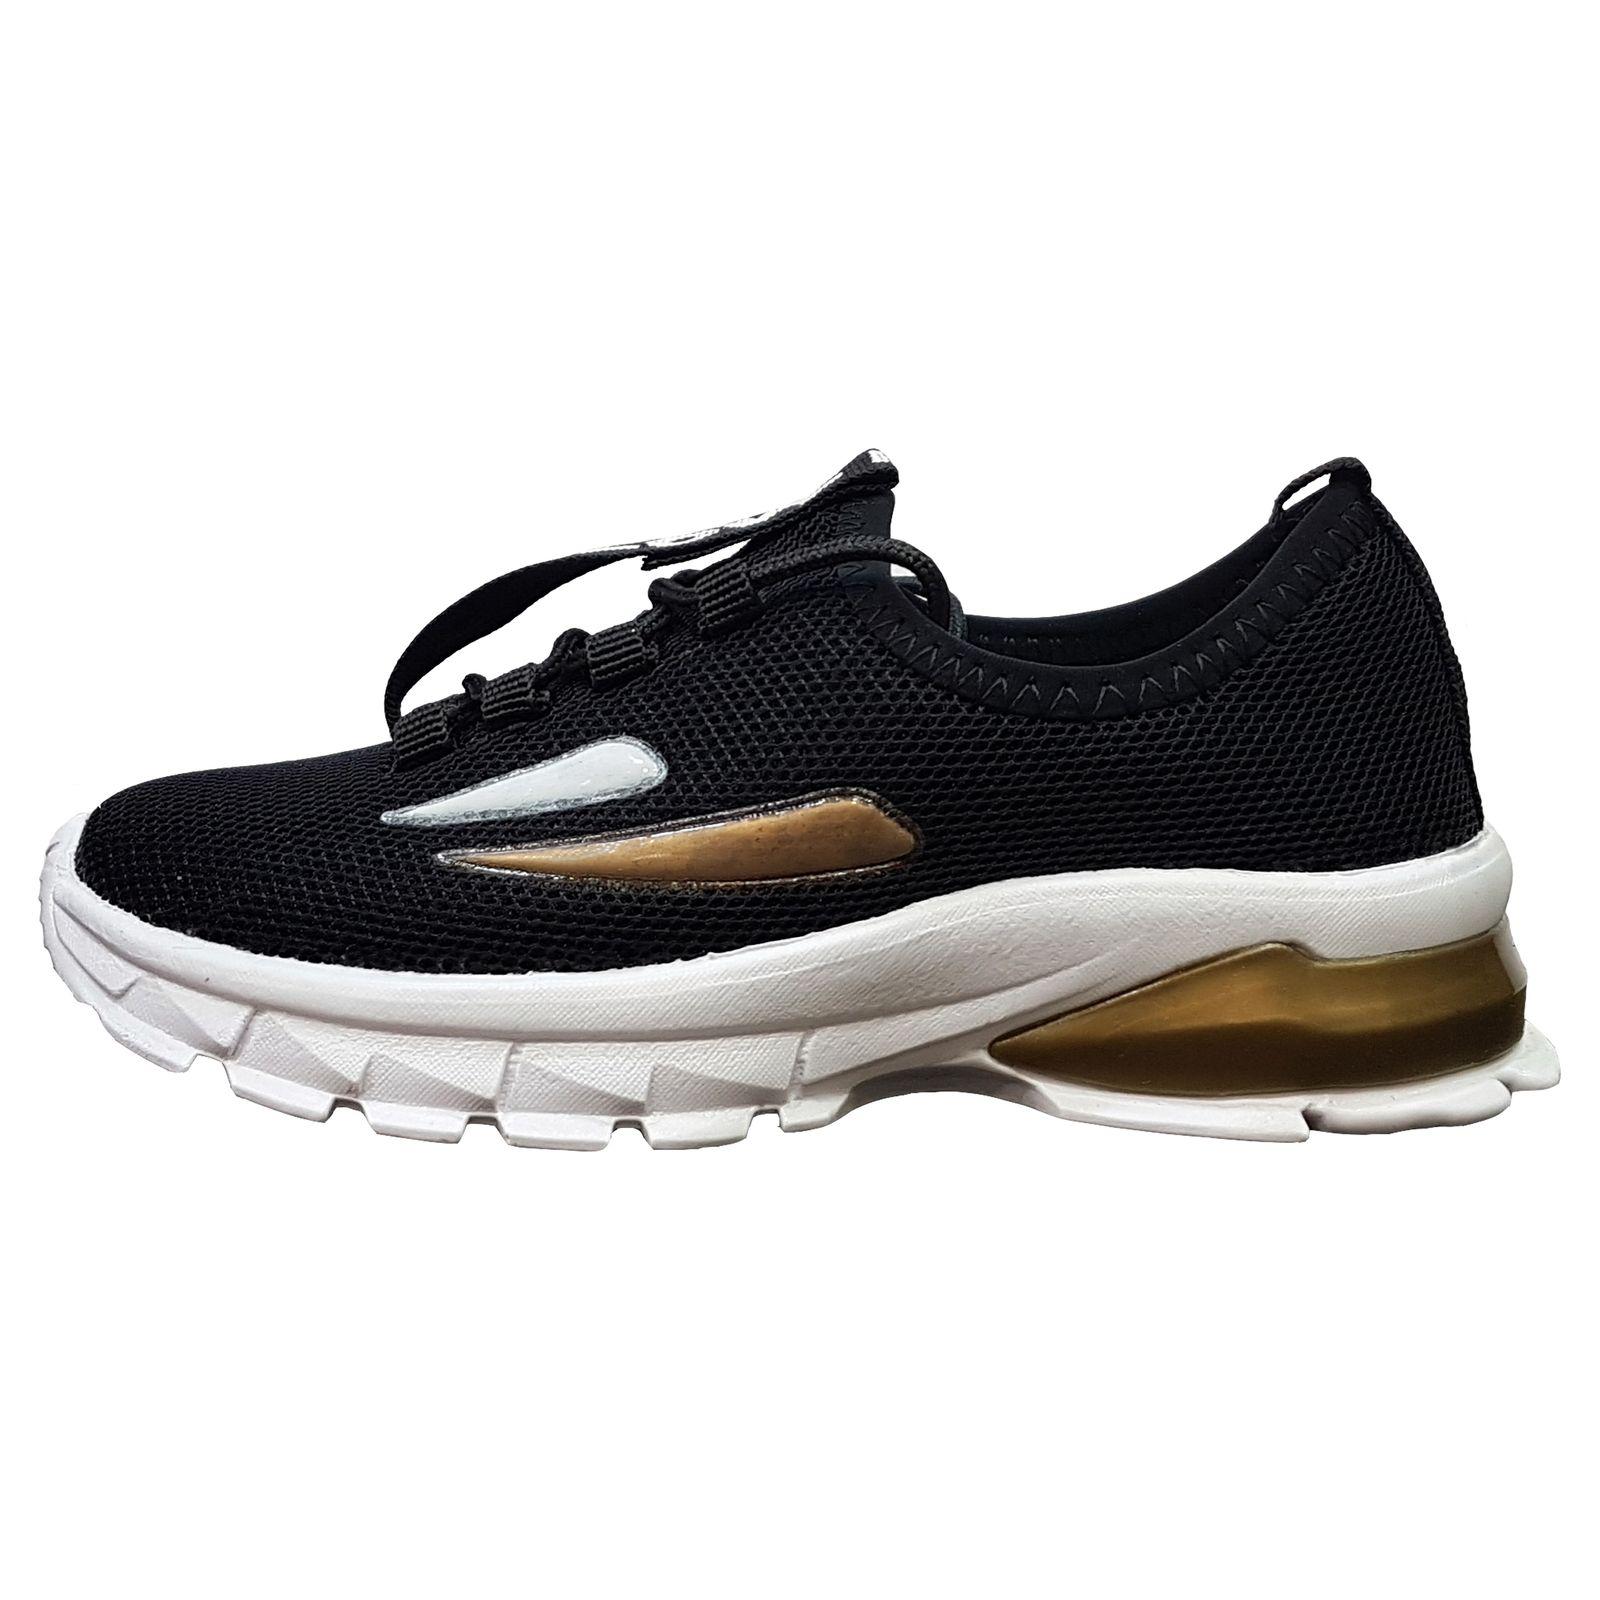 کفش پیاده روی پسرانه کد 3328129 -  - 3